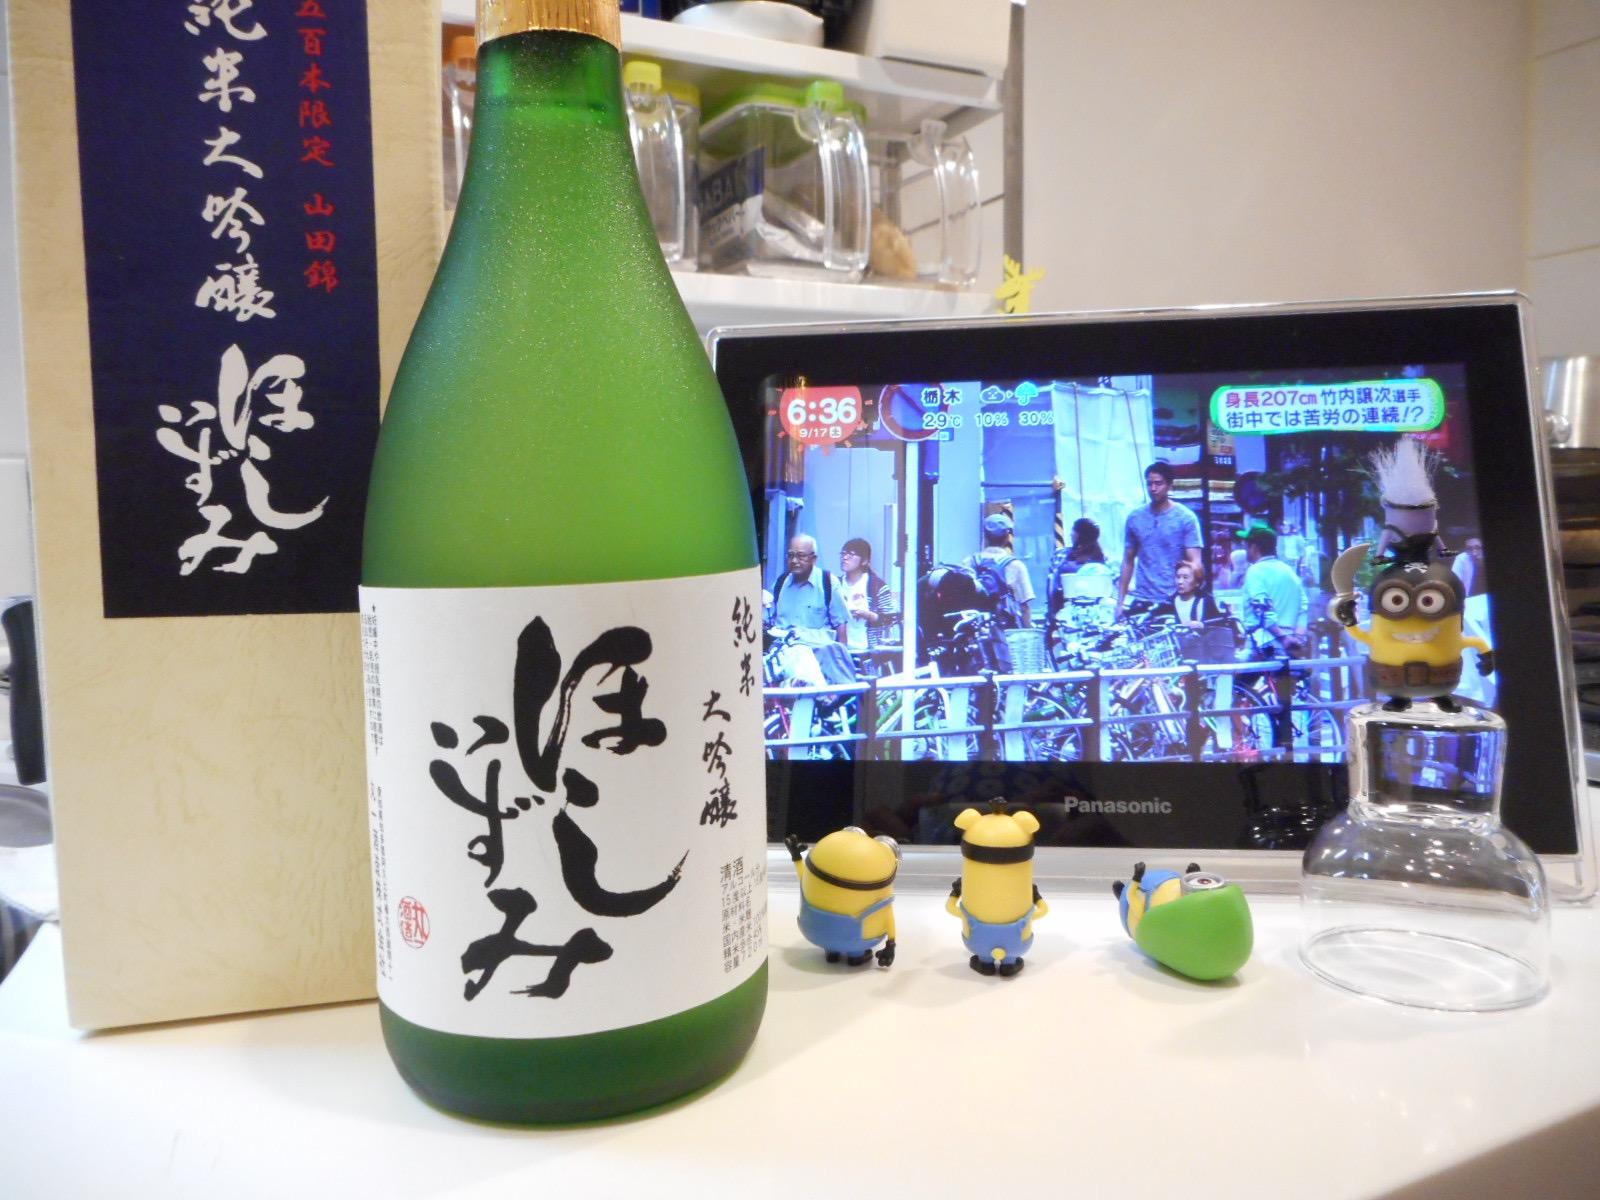 hoshiizumi_jundai_yamada45_27by1.jpg